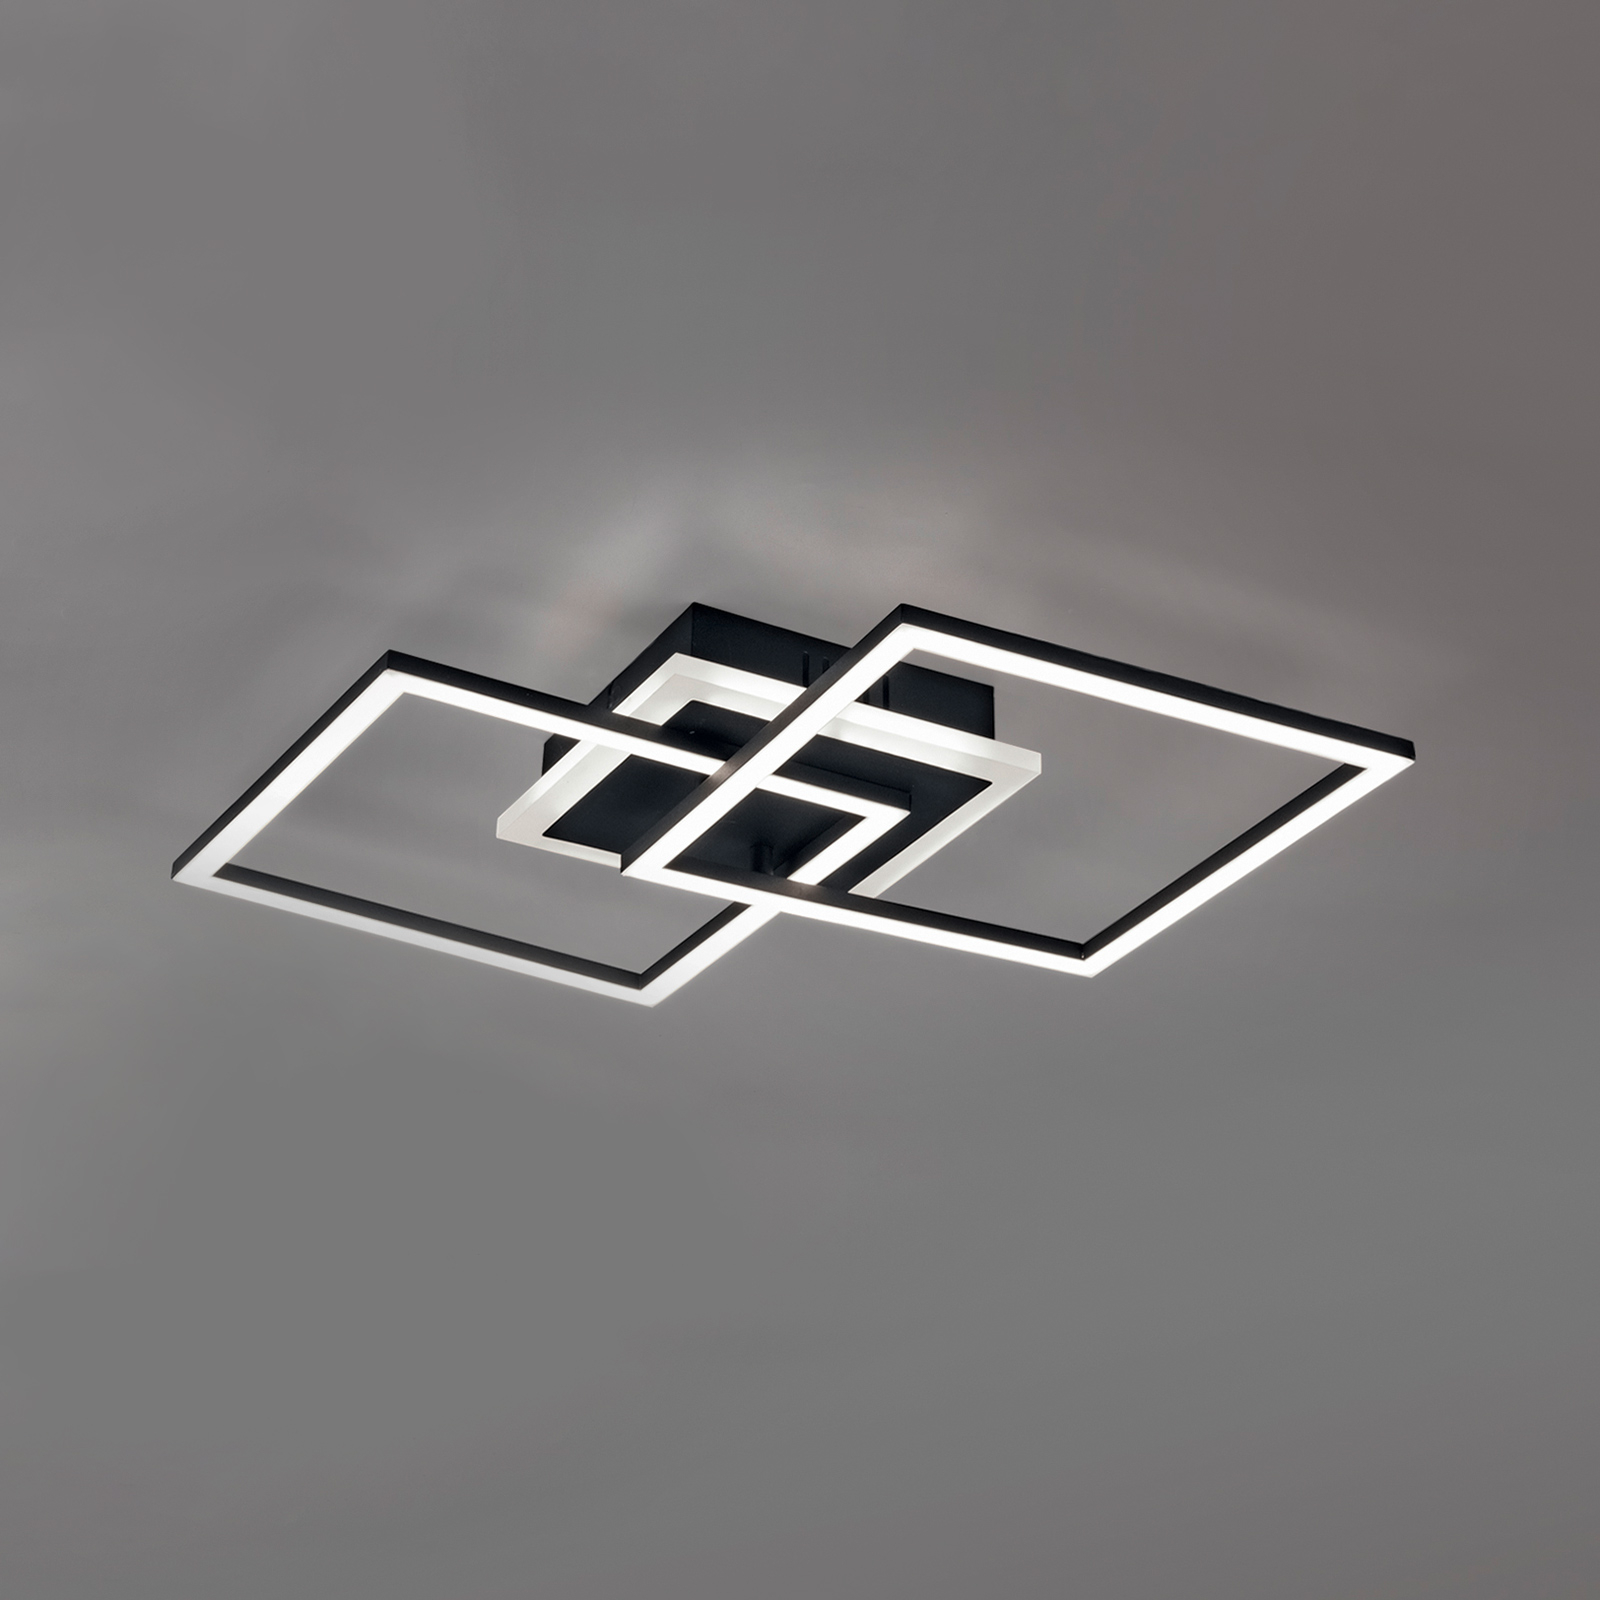 Lampa sufitowa LED Venida, czarna, dwa kwadraty